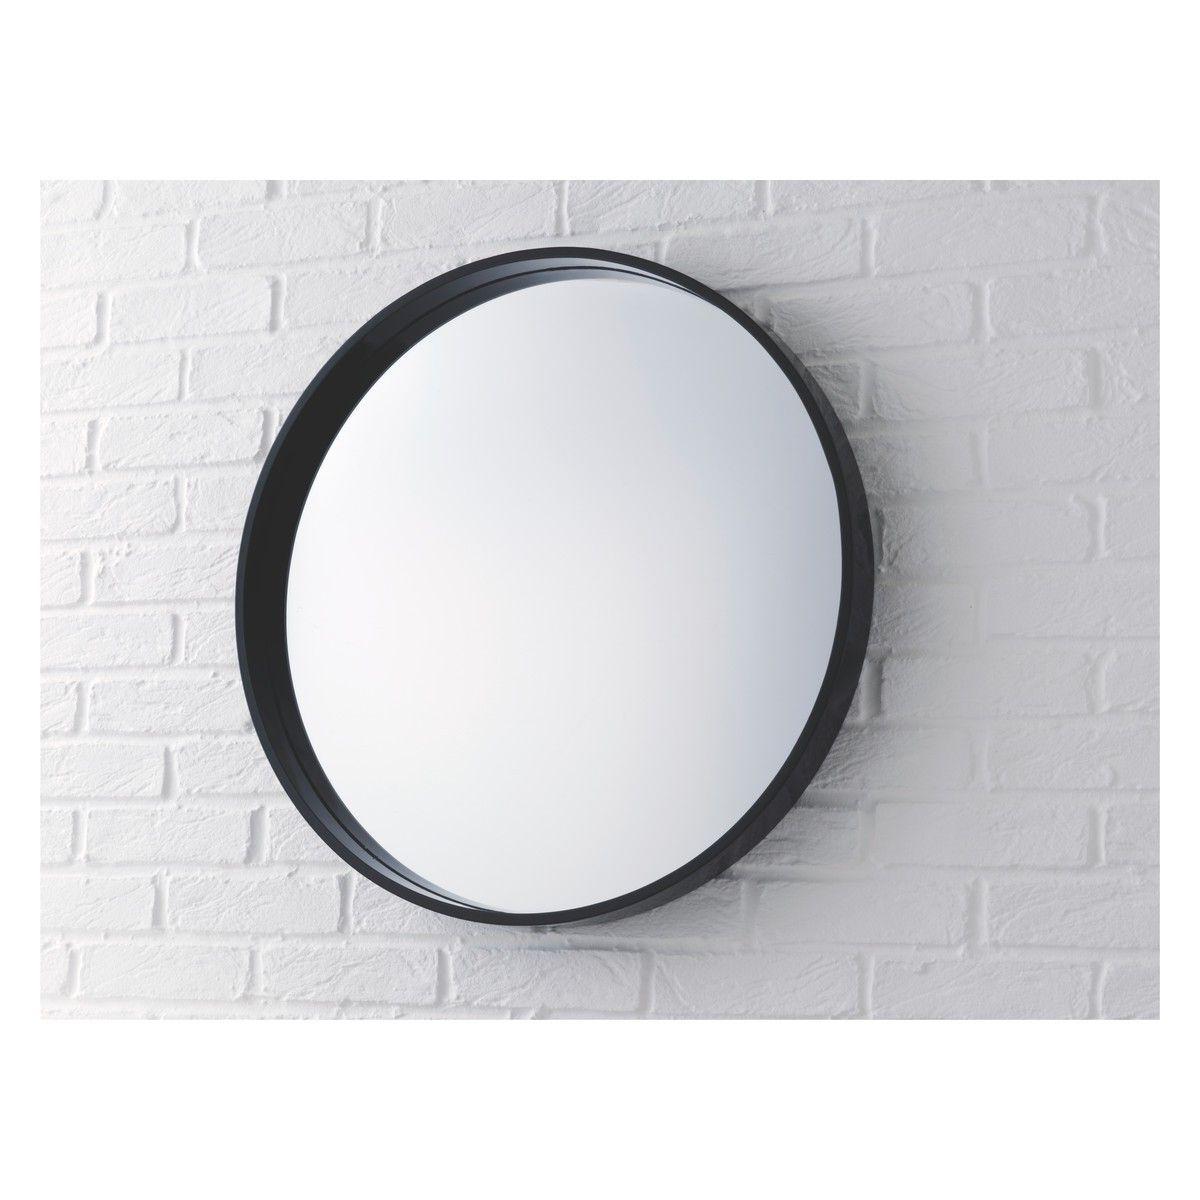 Aimee Black High Gloss Round Wall Mirror D65cm (View 10 of 20)